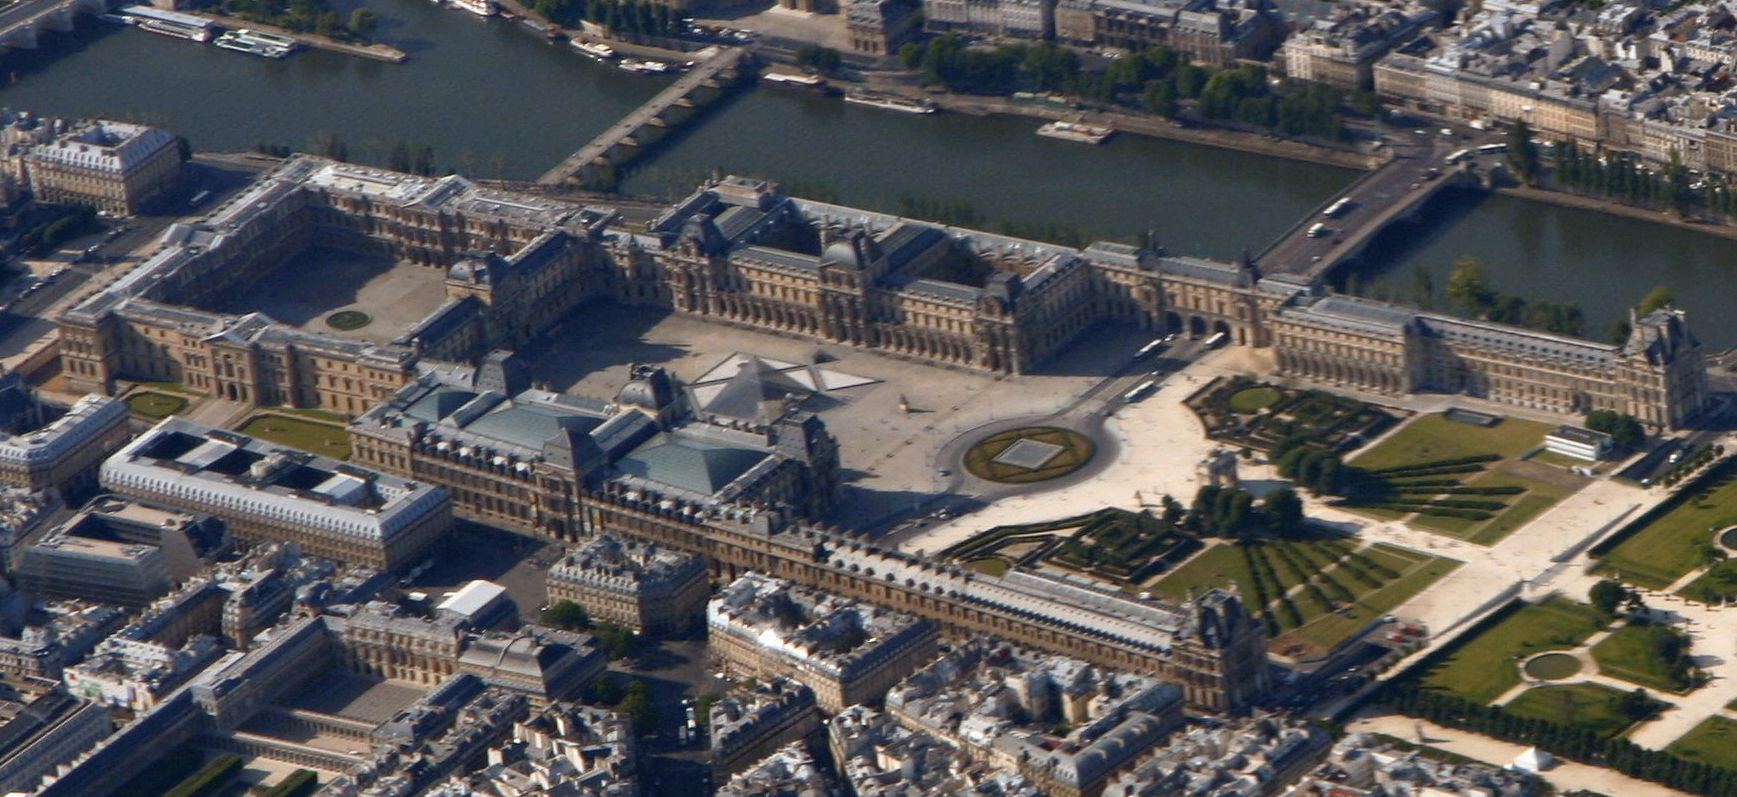 Louvre Palace Today |© Wikicommons